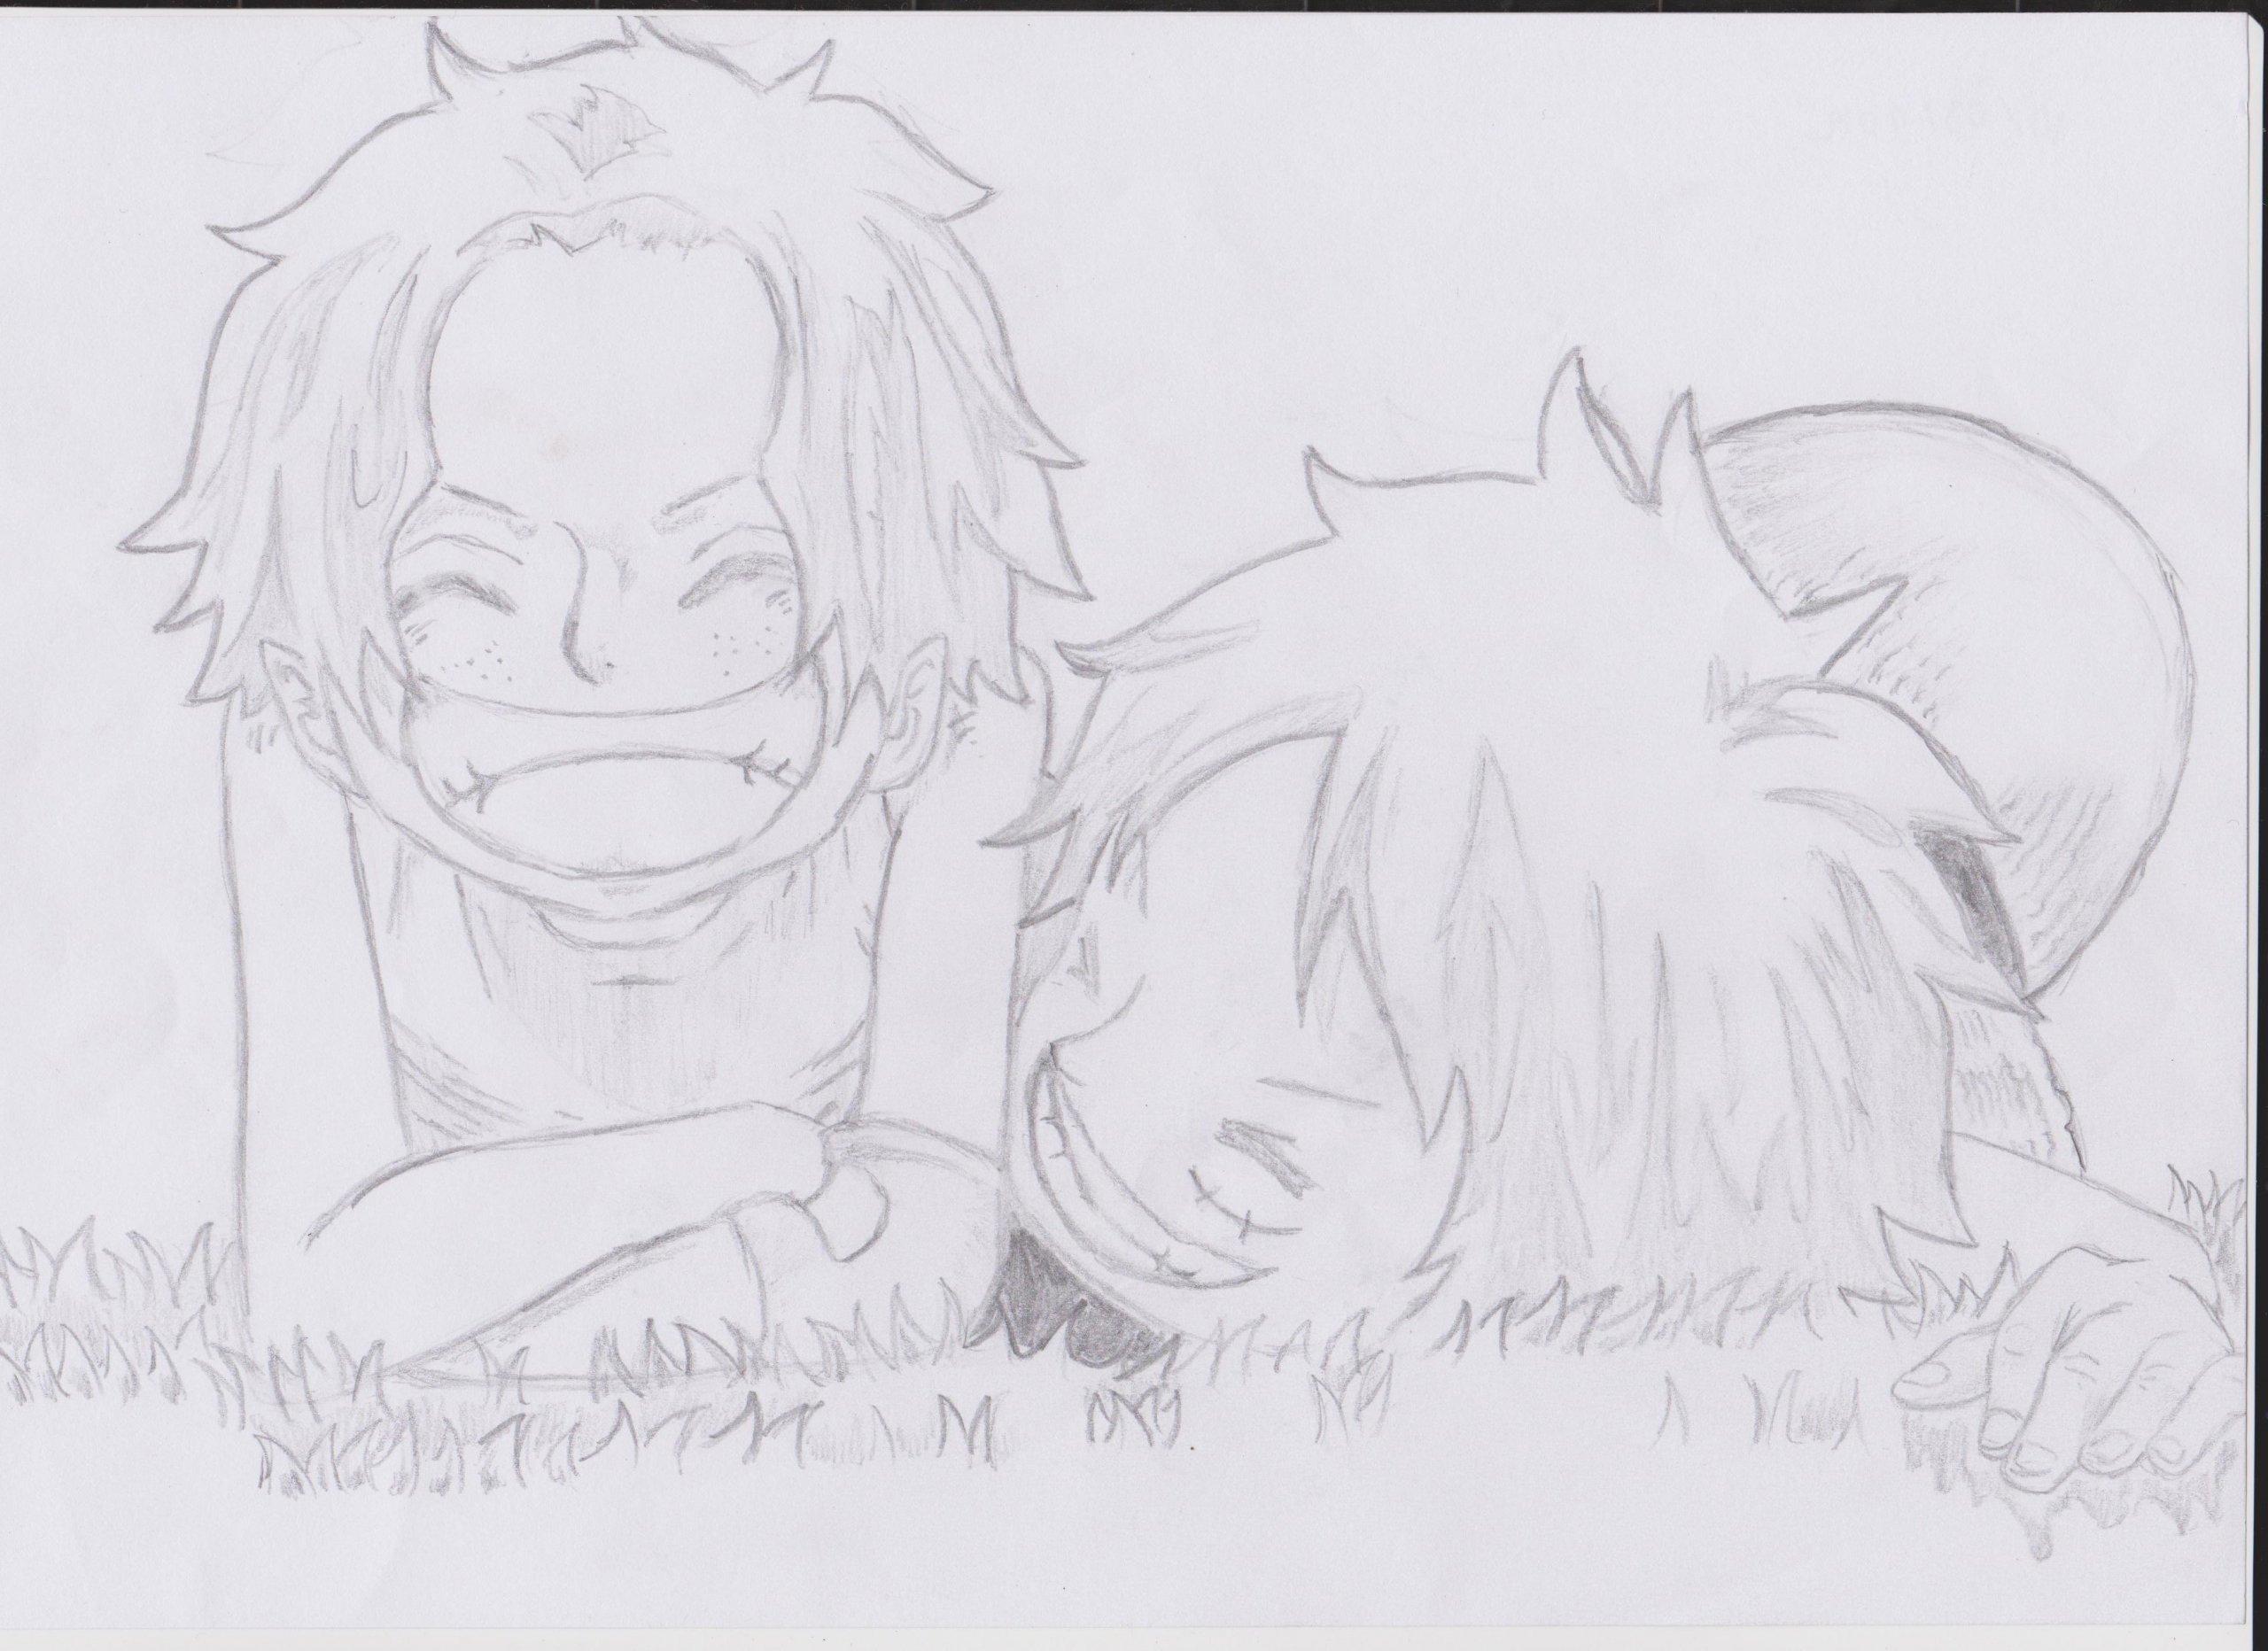 Fonds d'écran Art - Crayon Manga - One piece Portgas D Ace et Monkey D Luffy